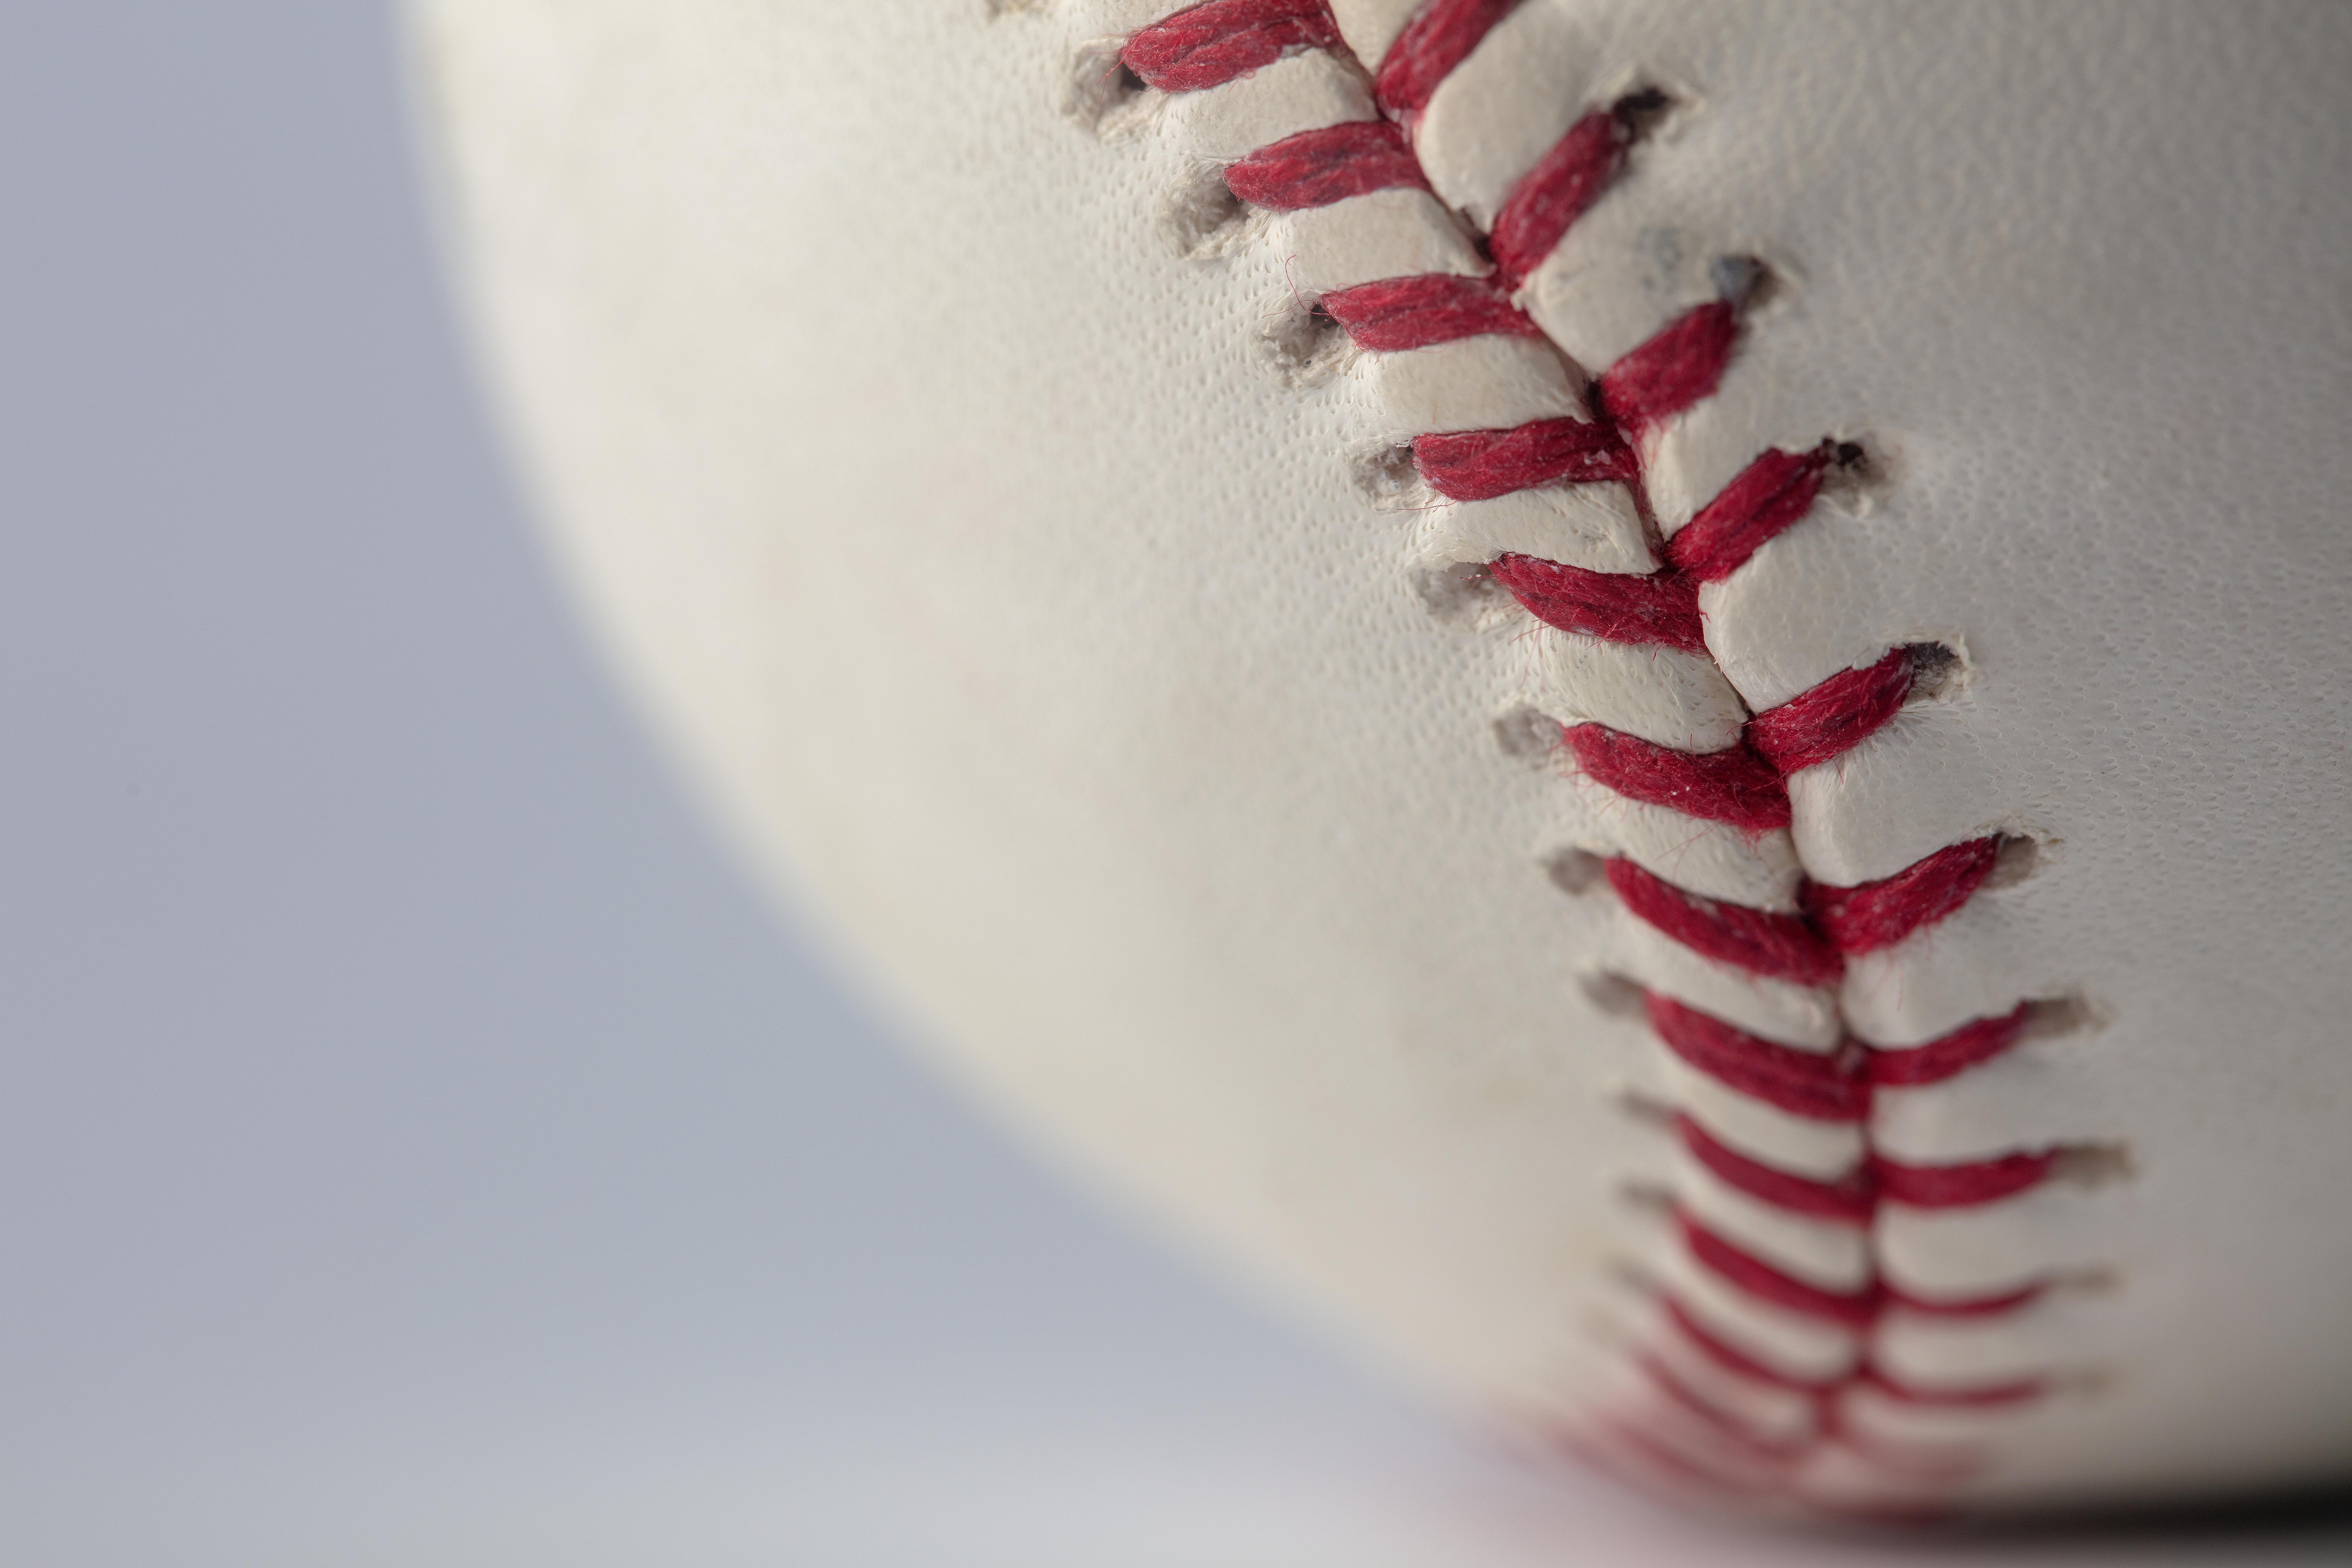 An official Rawlings Major League Baseball for the 2021 Major League Baseball season.